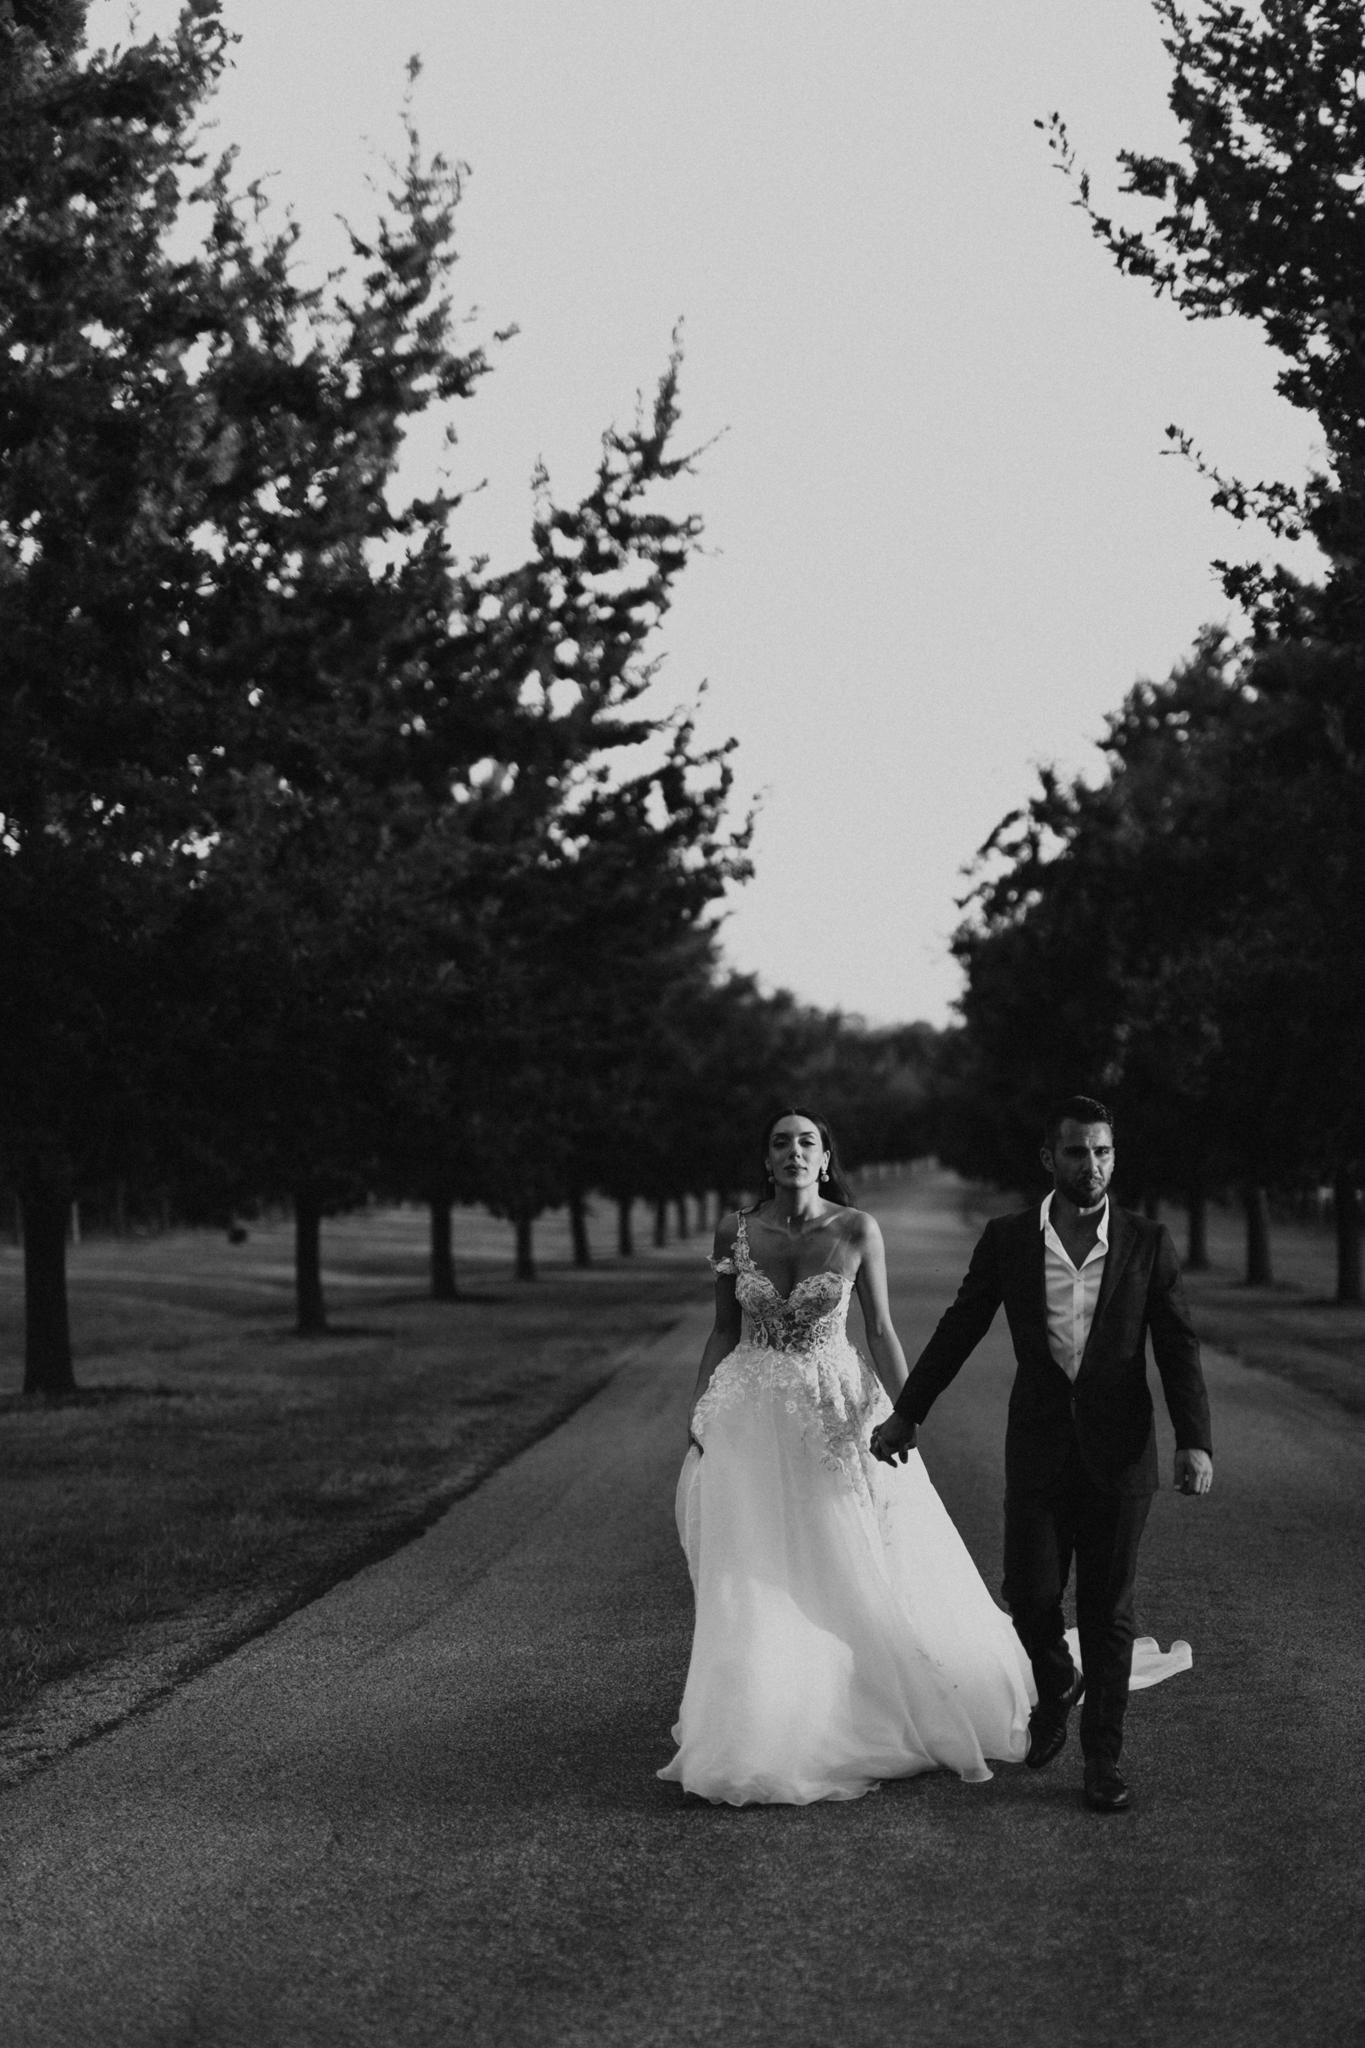 The-Stones-of-Yarra-Valley-Wedding-EmotionsandMathPhotography-220.jpg